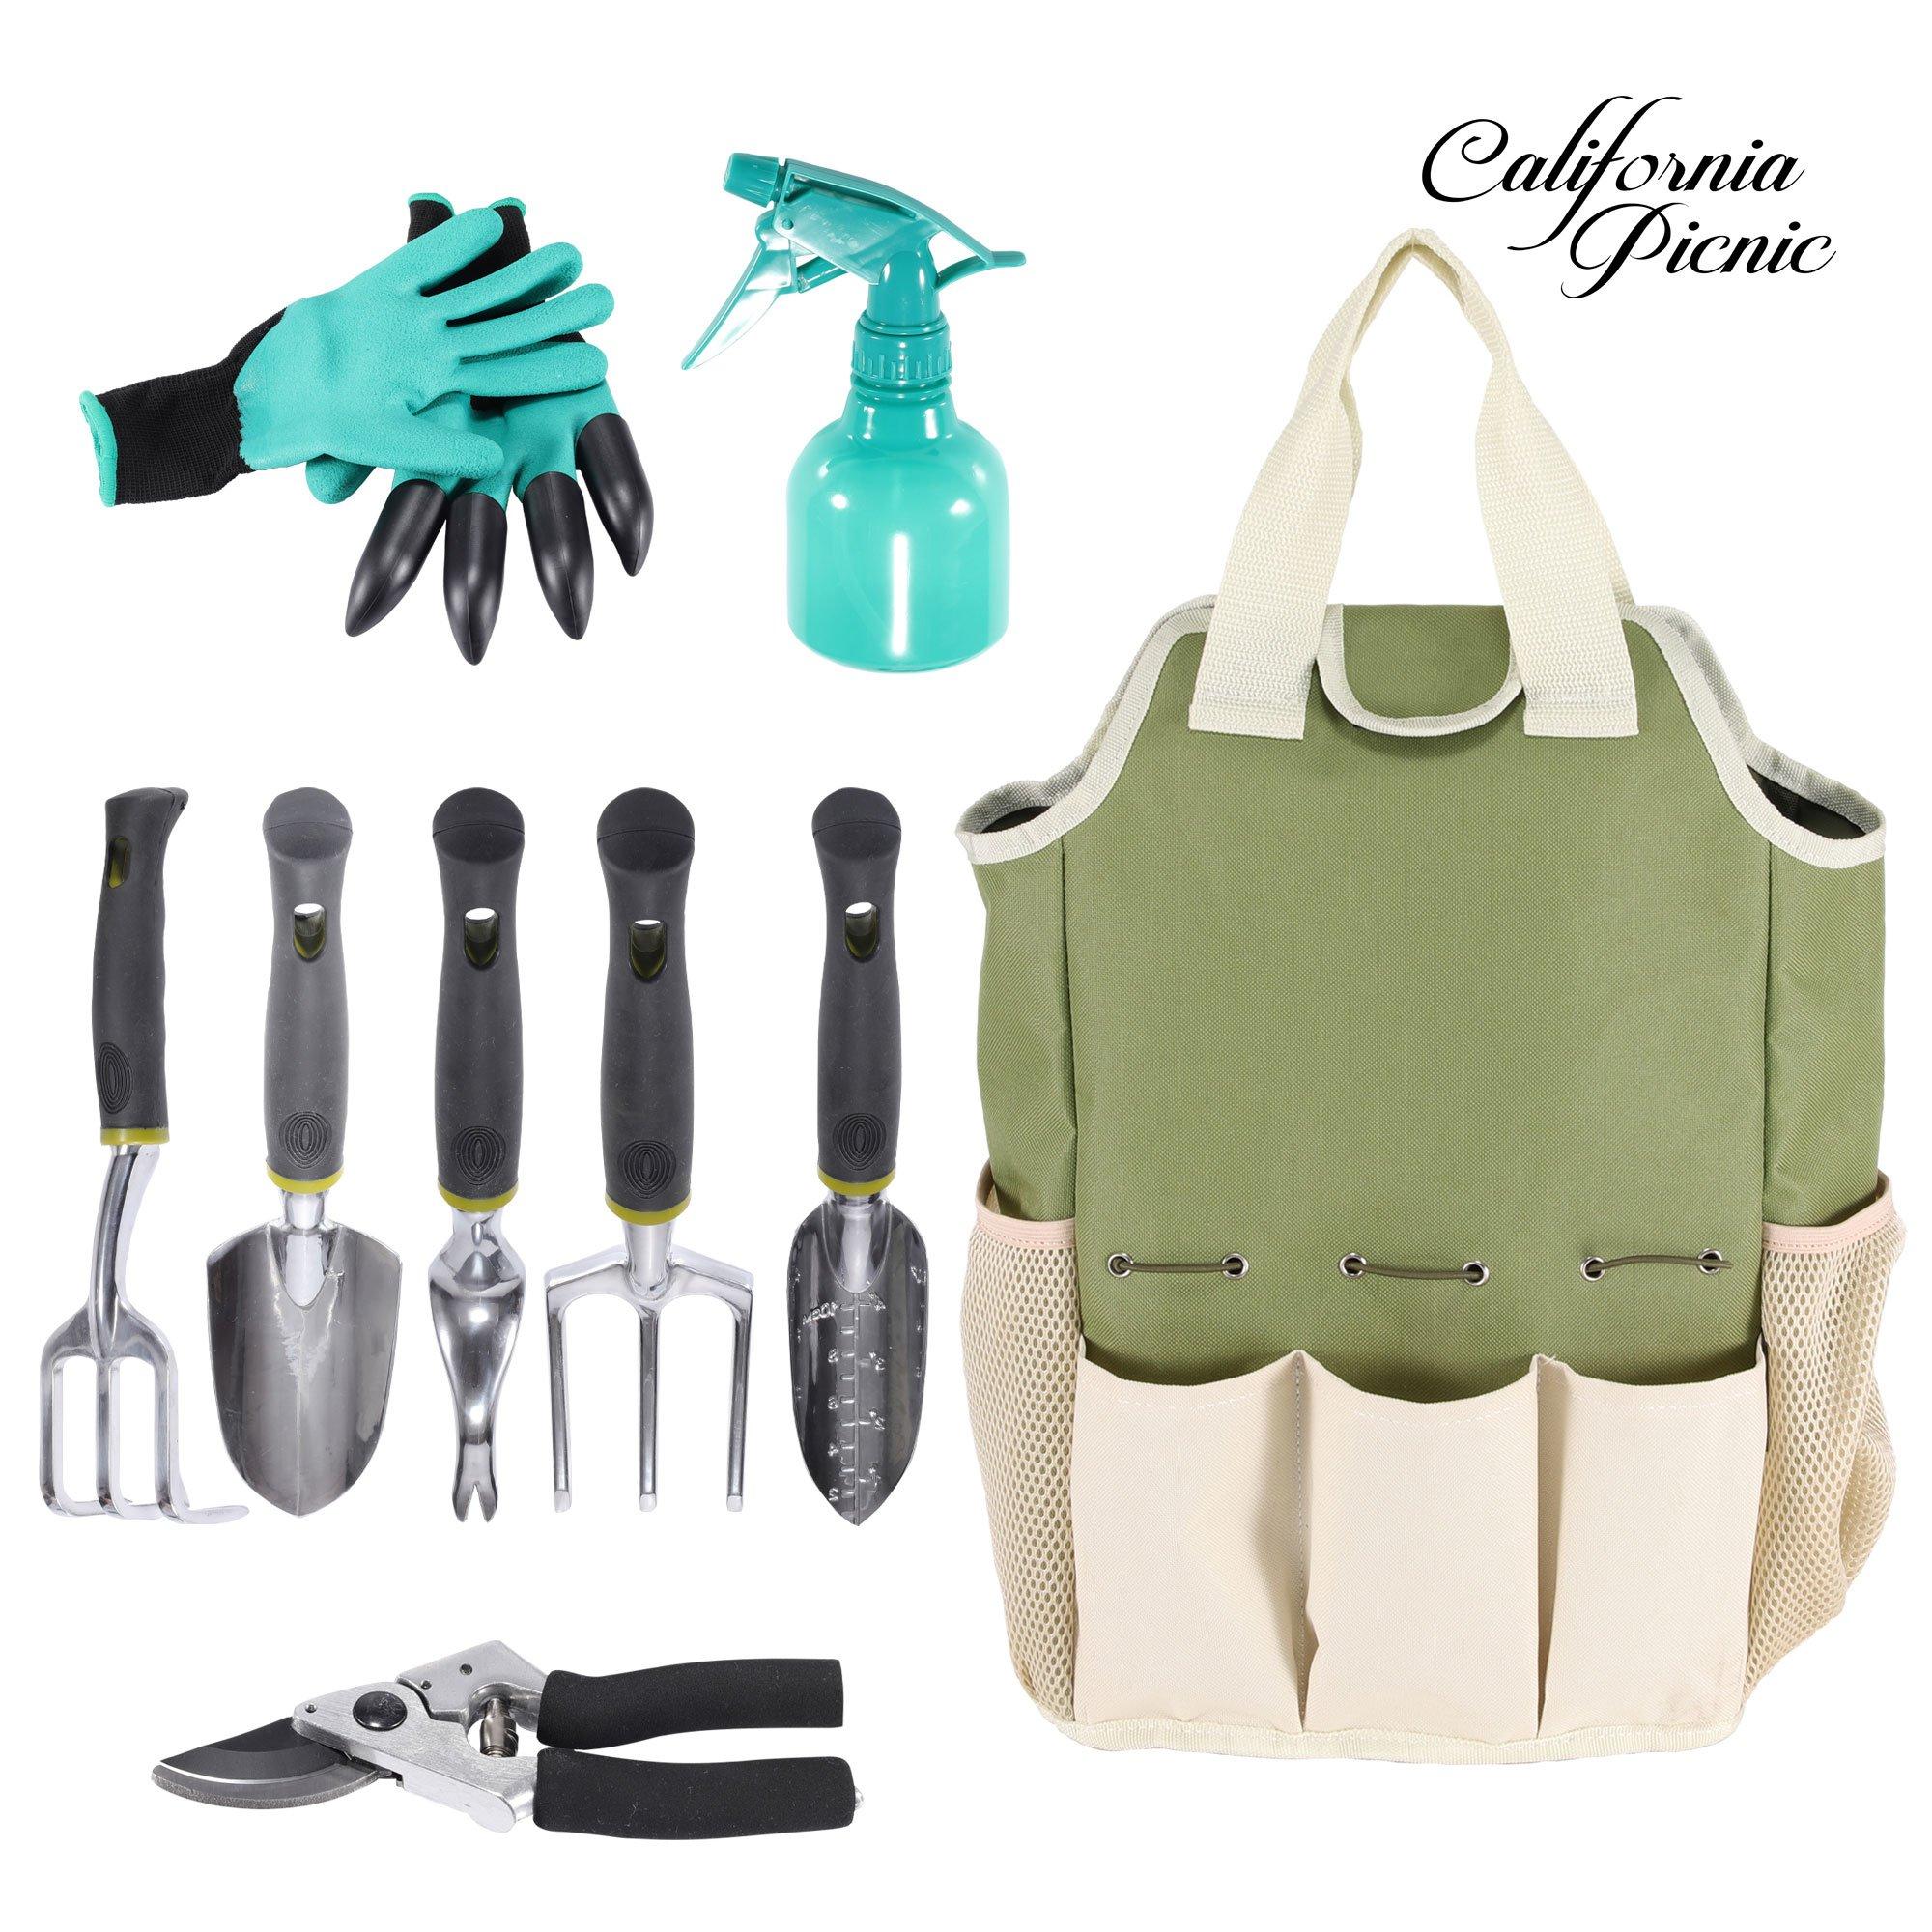 Gardening Tools Set | Garden Tool Organizer Tote | Gardening Gloves Included Great Garden Tools for Woman and Men | 9 Piece Garden Accessories Tool Organizer Kit | Gardening Gifts | Gardeners Supply